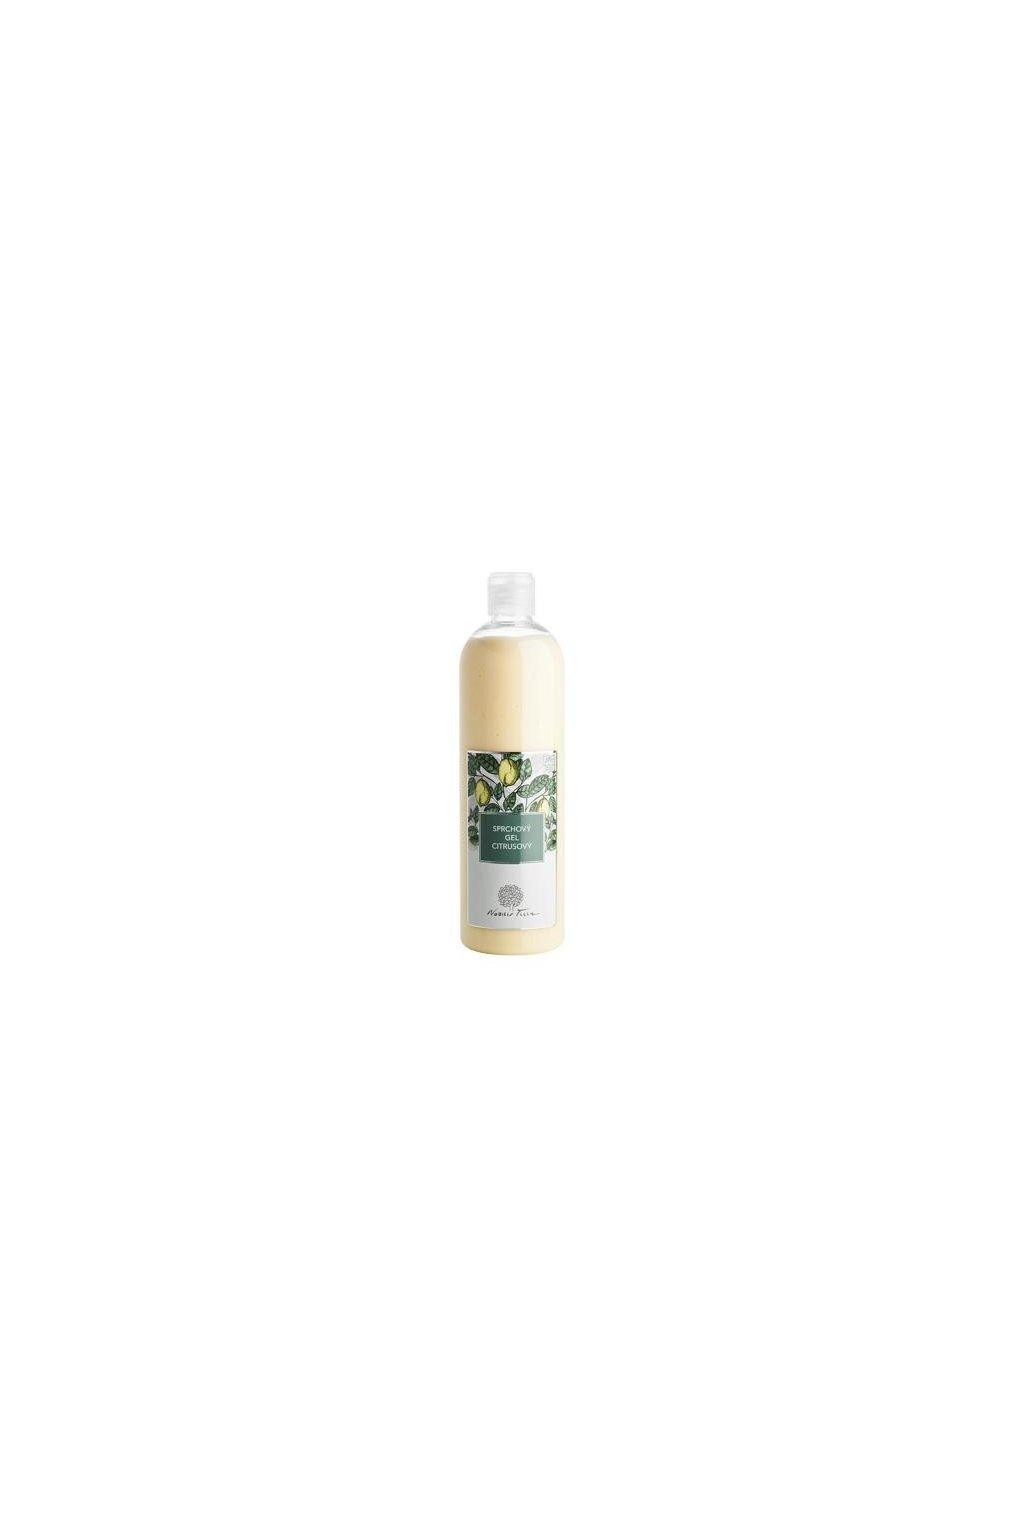 10586 nobilis tilia sprchovy gel citrusovy 500 ml